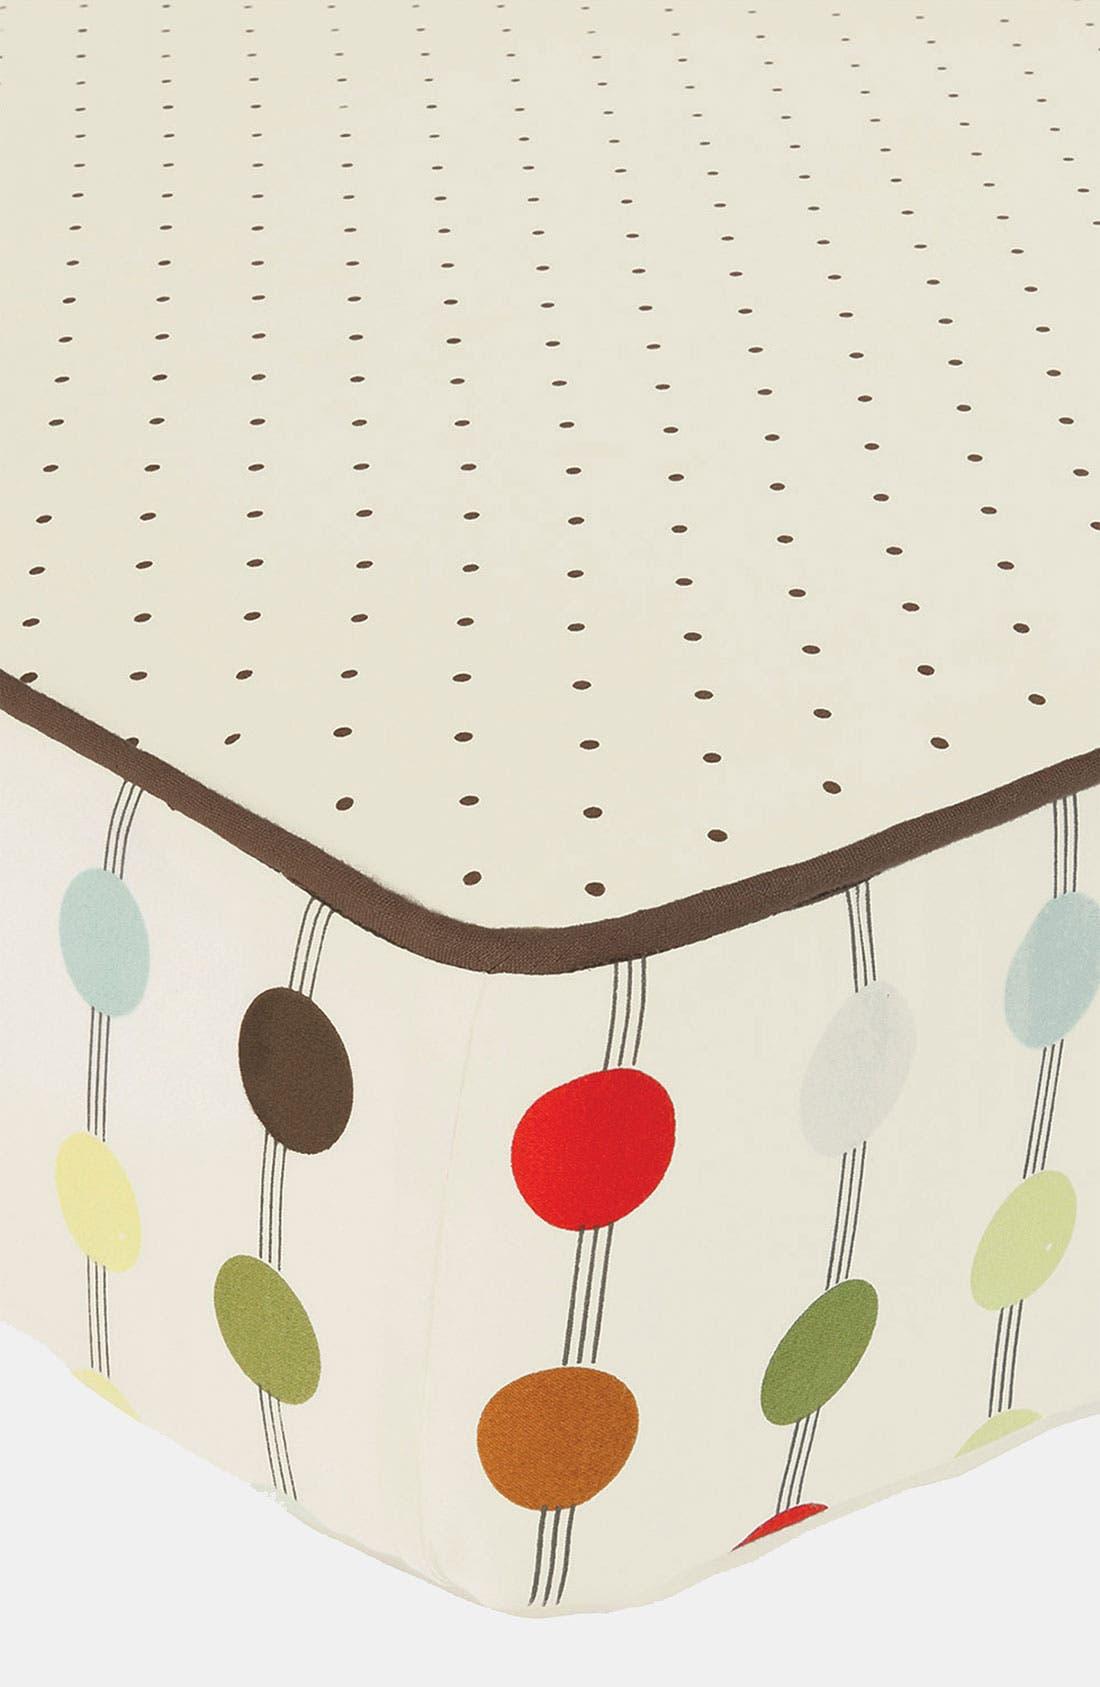 Alternate Image 1 Selected - Skip Hop 'Complete Sheet™' Fitted Crib Sheet